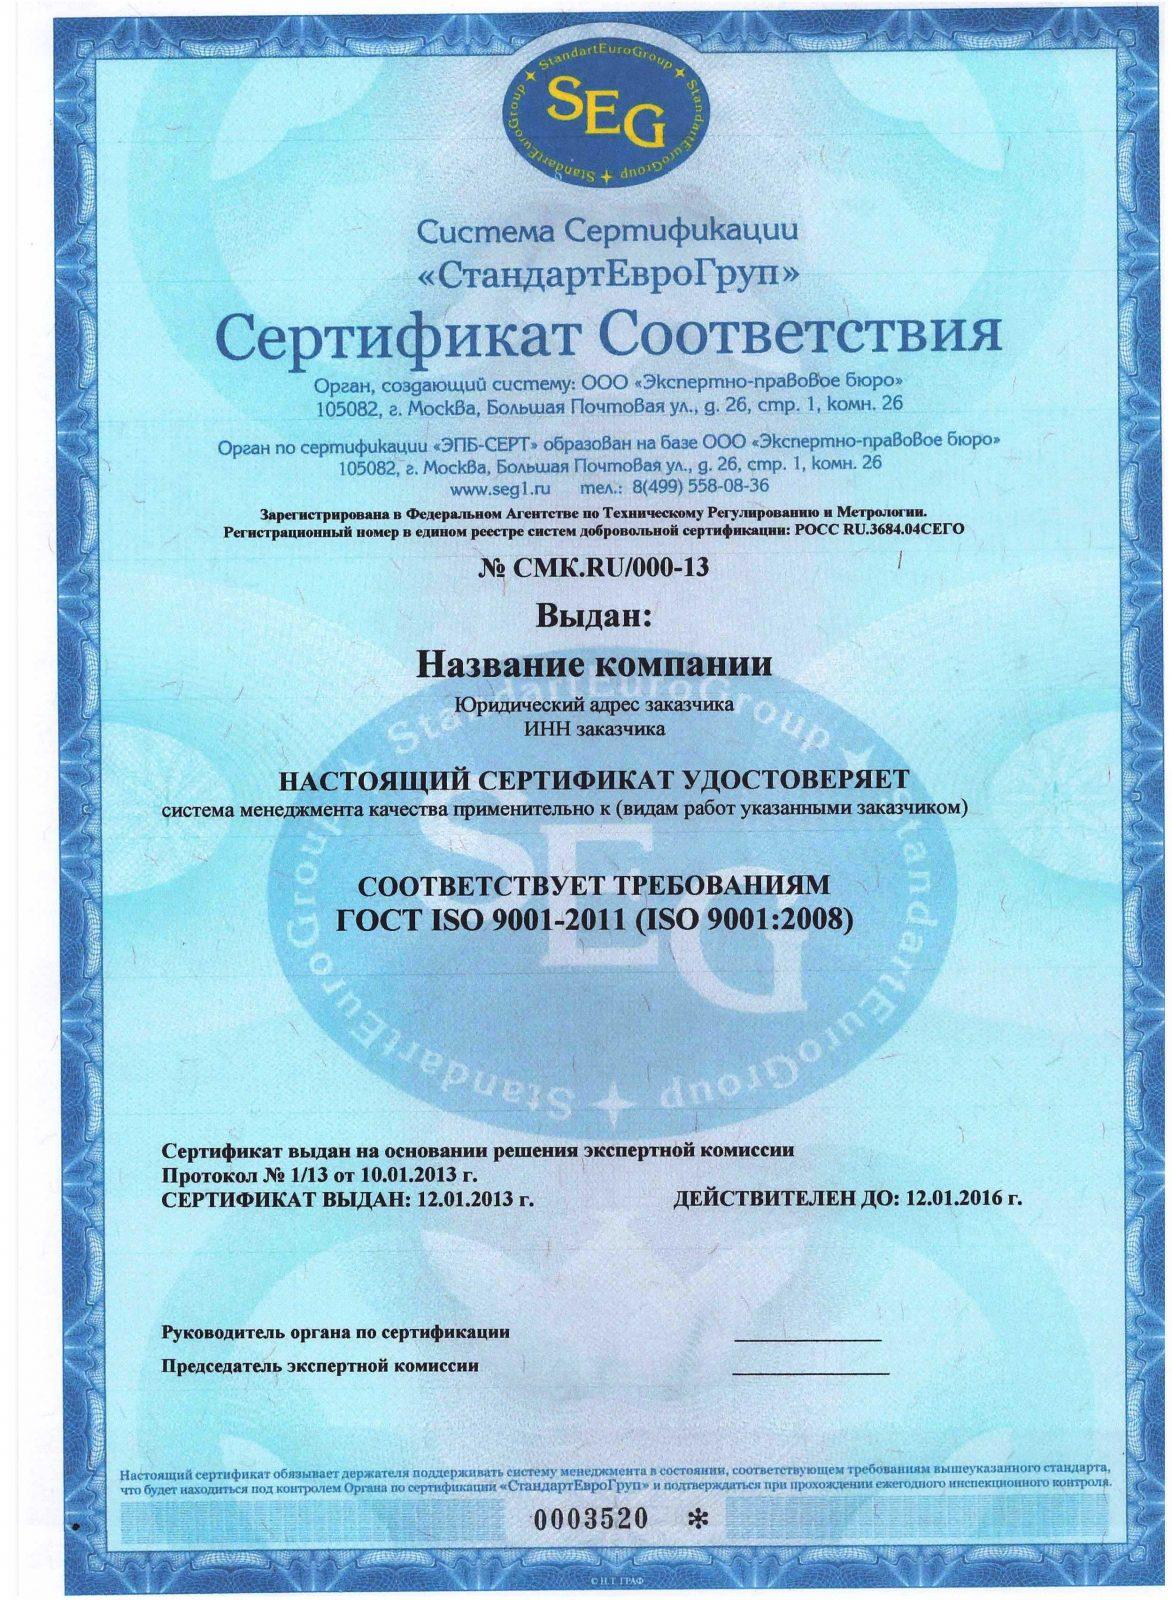 цена ИСО 9001 2015 в Элисте